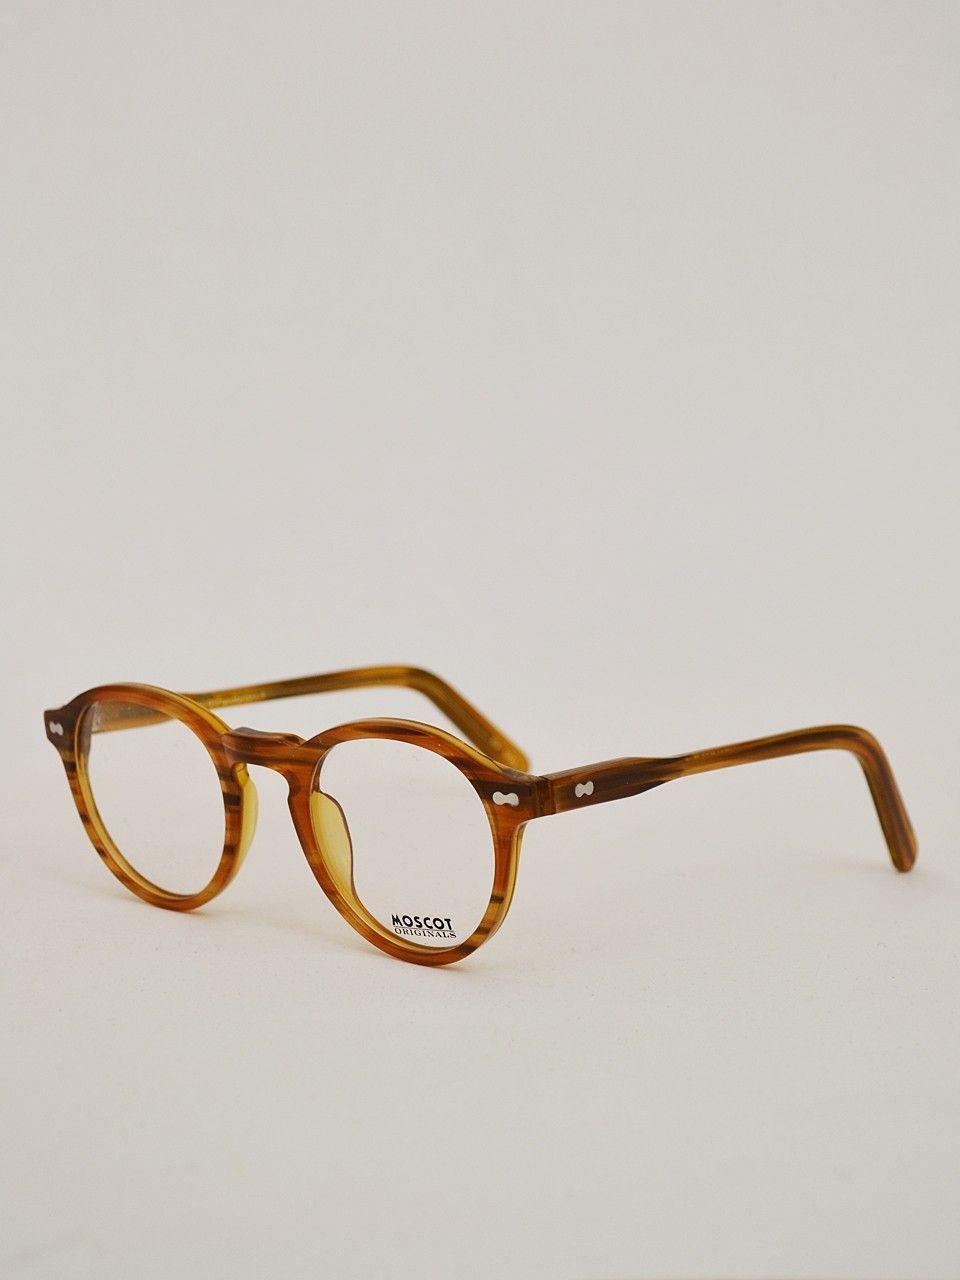 2b77337ce2cb Pierre and Josephine glasses